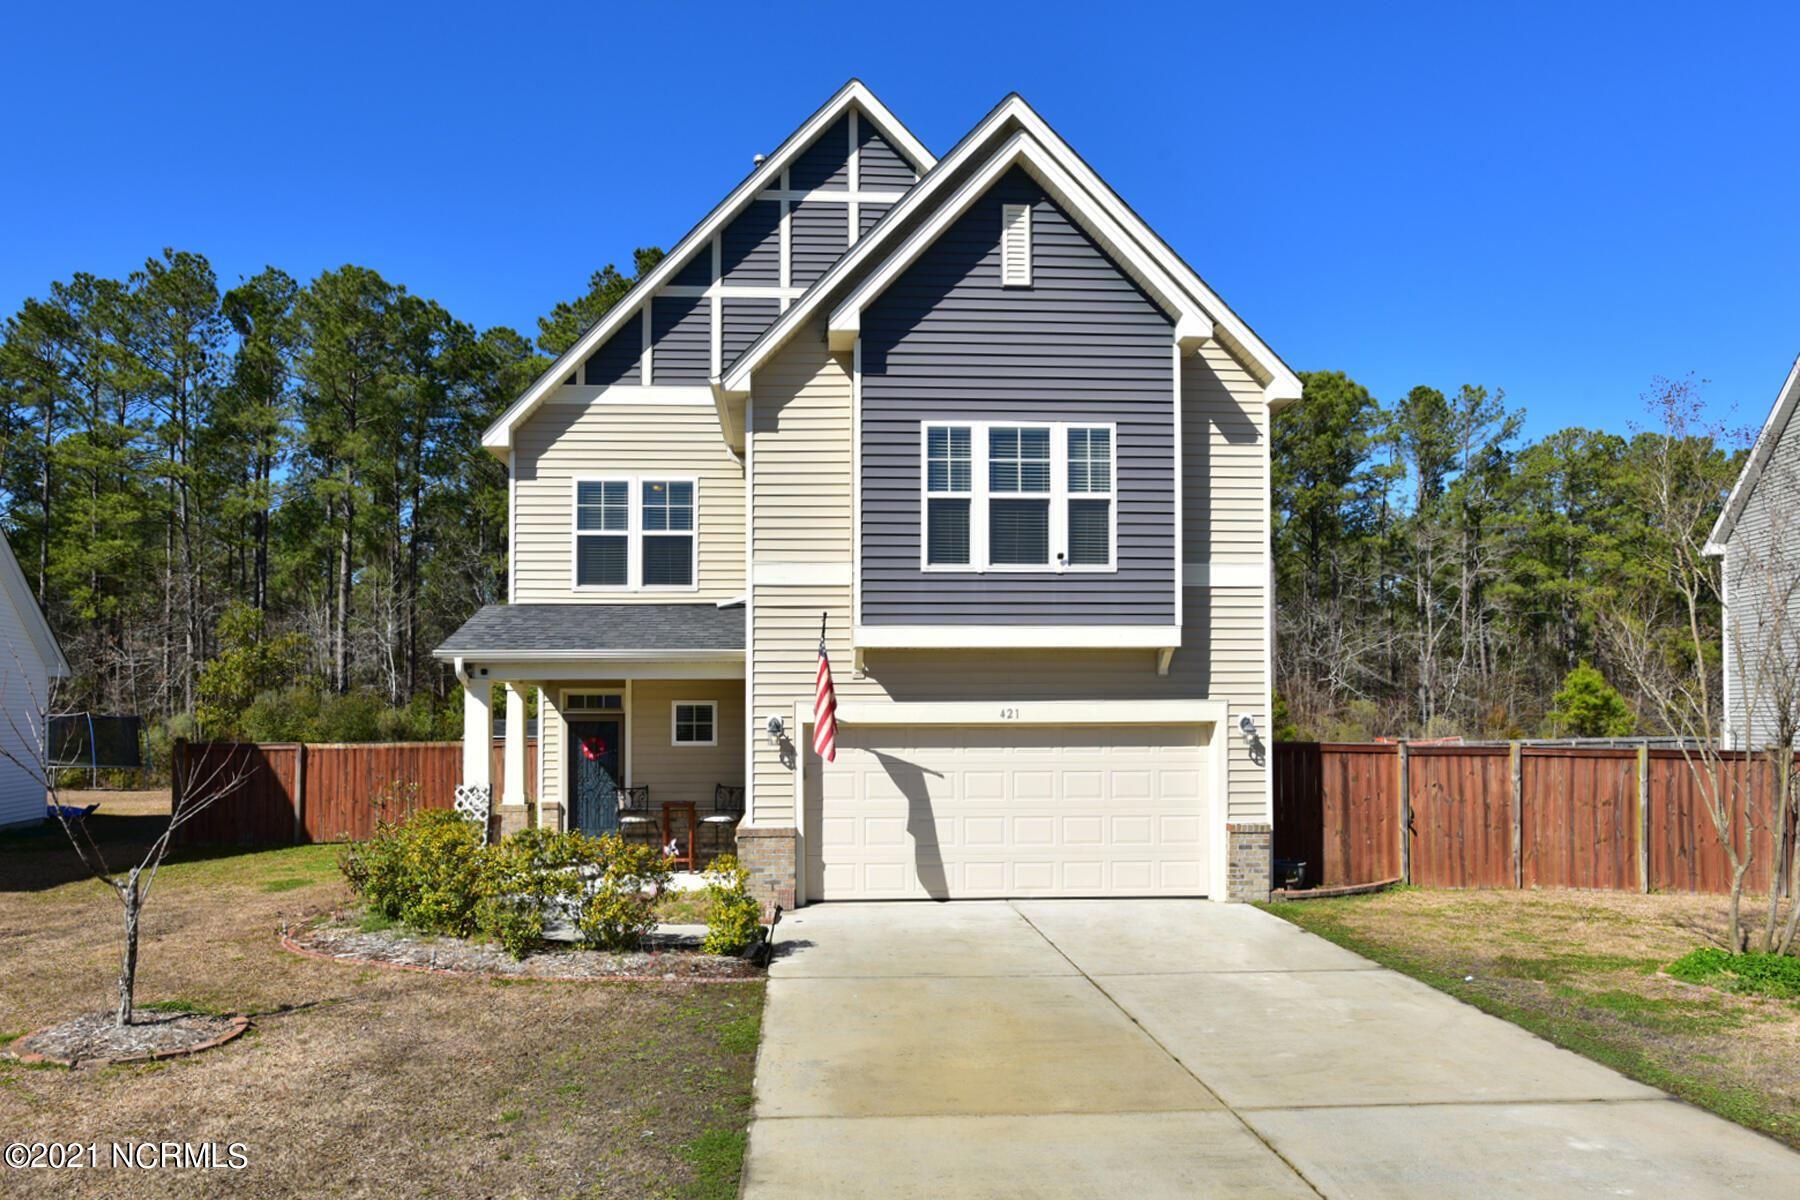 Photo of 421 Savannah Drive, Jacksonville, NC 28546 (MLS # 100285980)